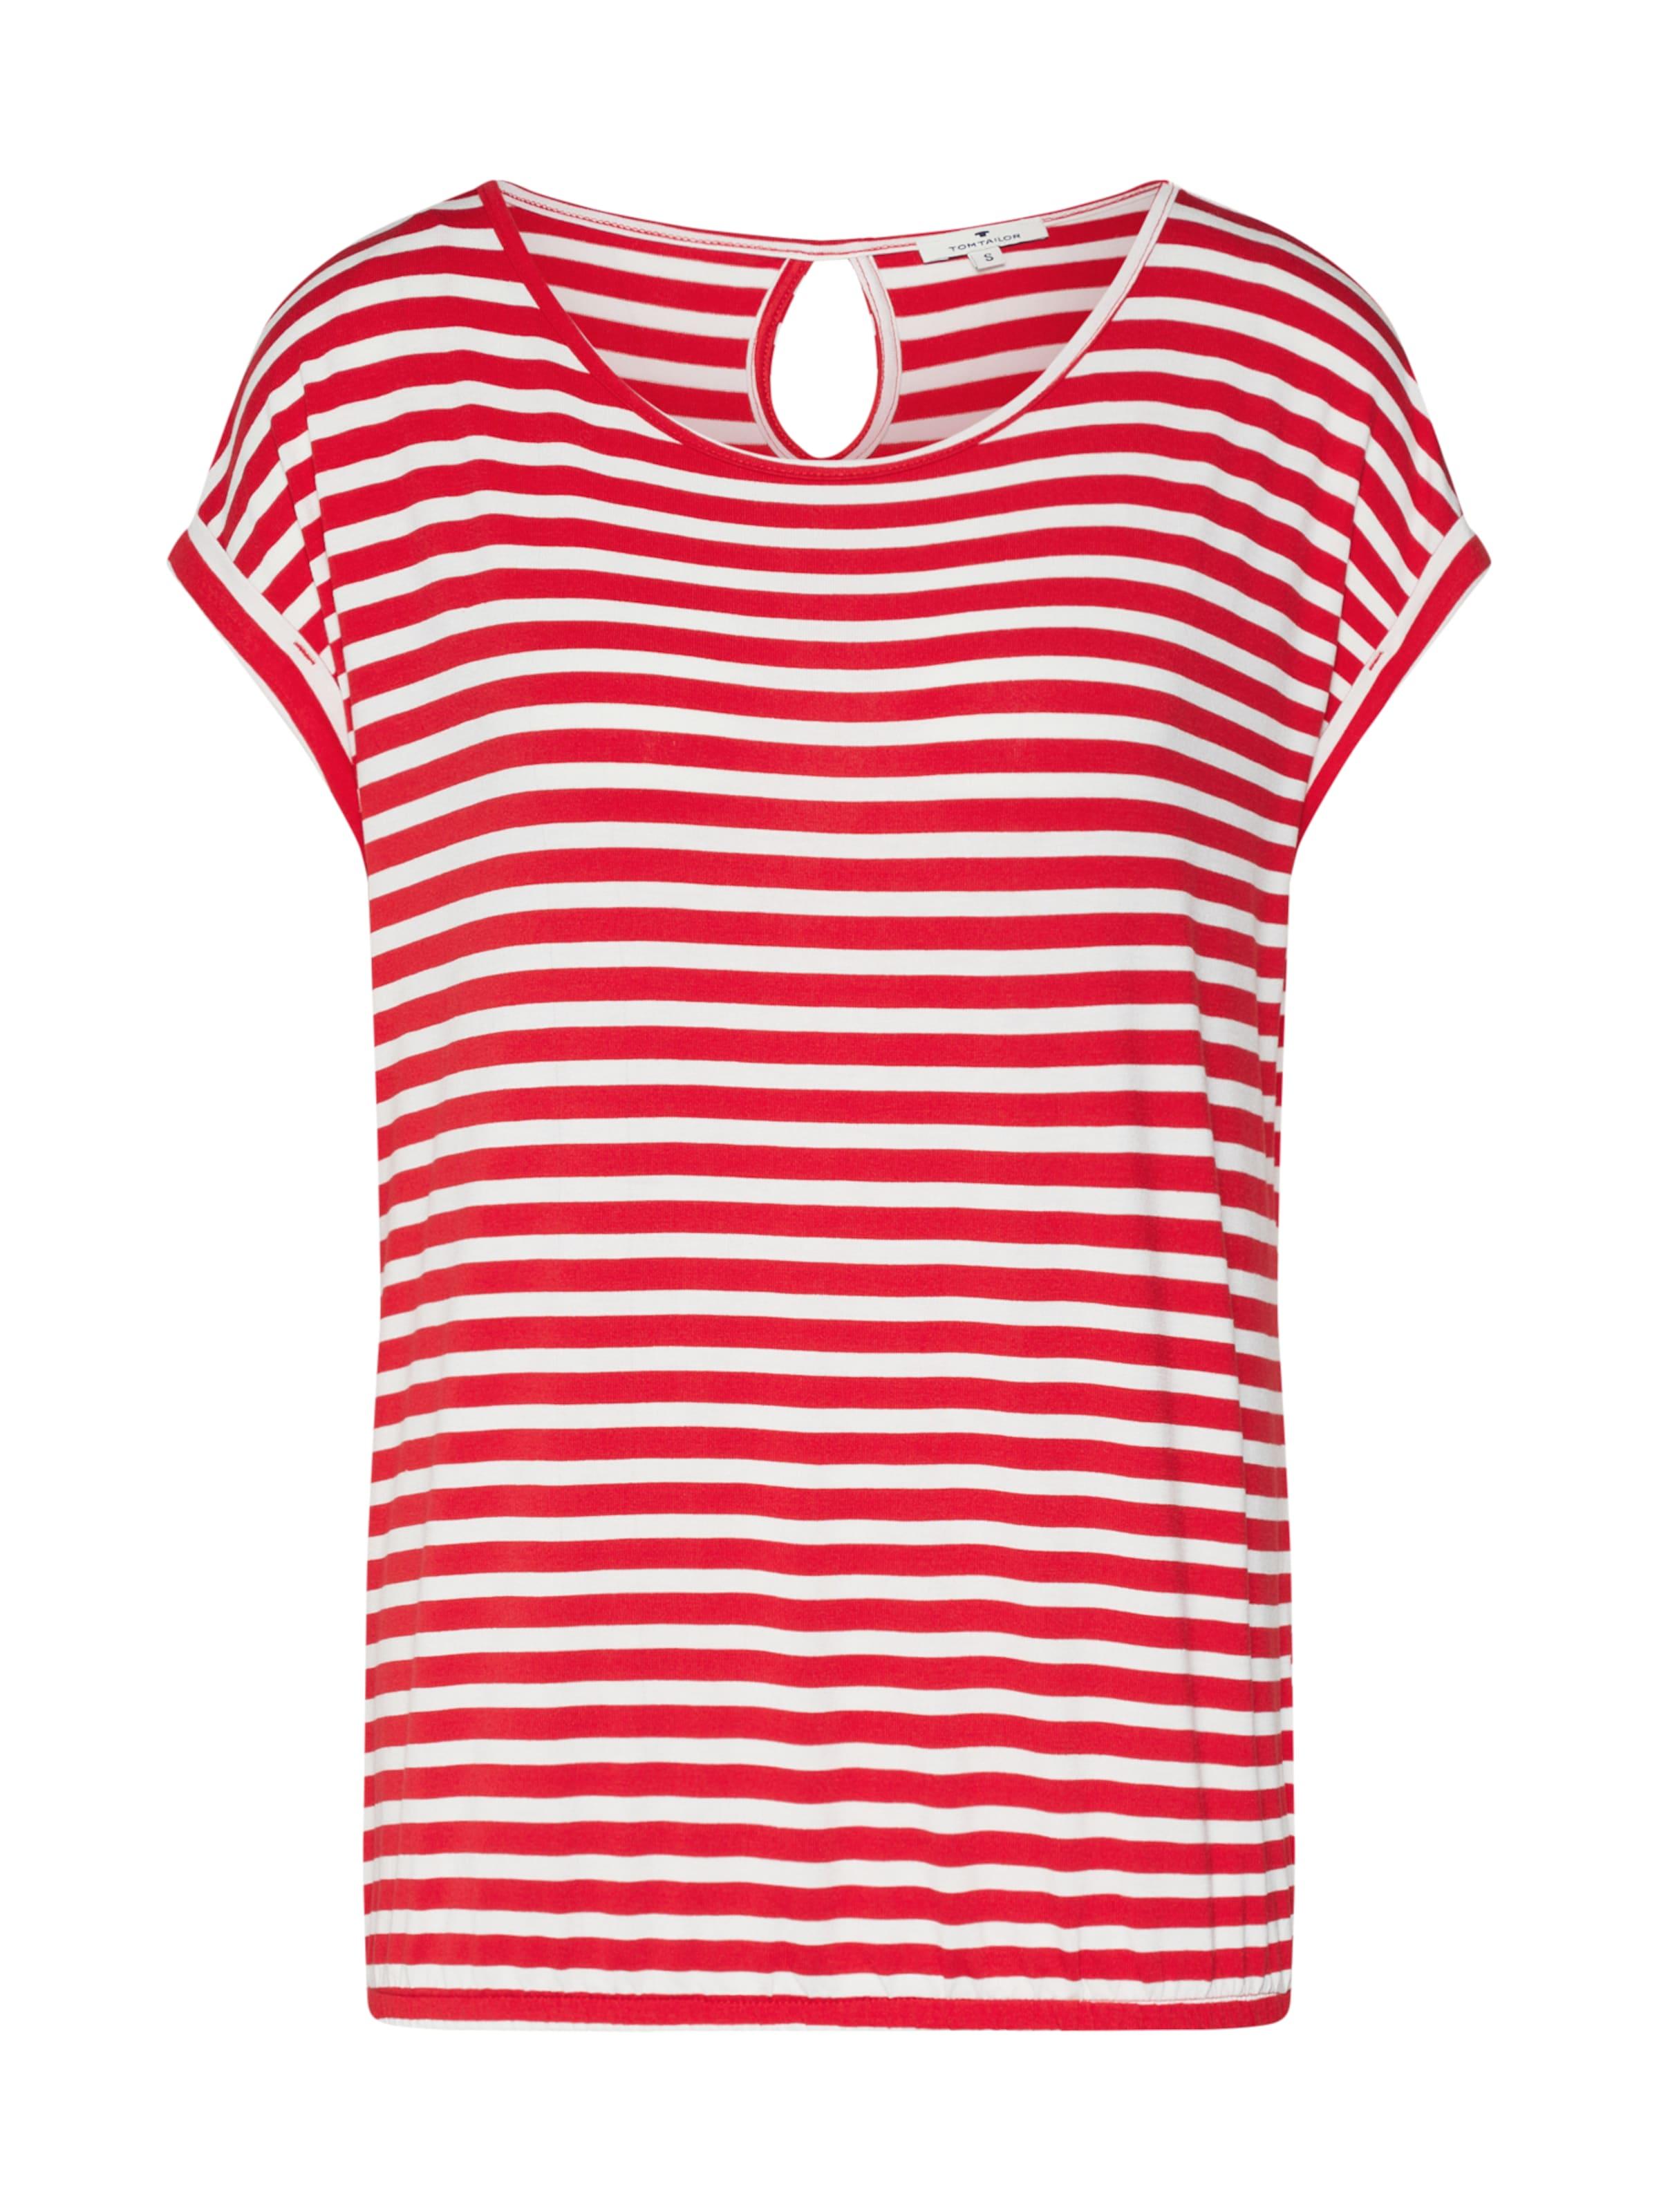 Tailor Rot Tailor In Shirt Tailor Rot Shirt Tom Tom Tom In Shirt wPk0nO